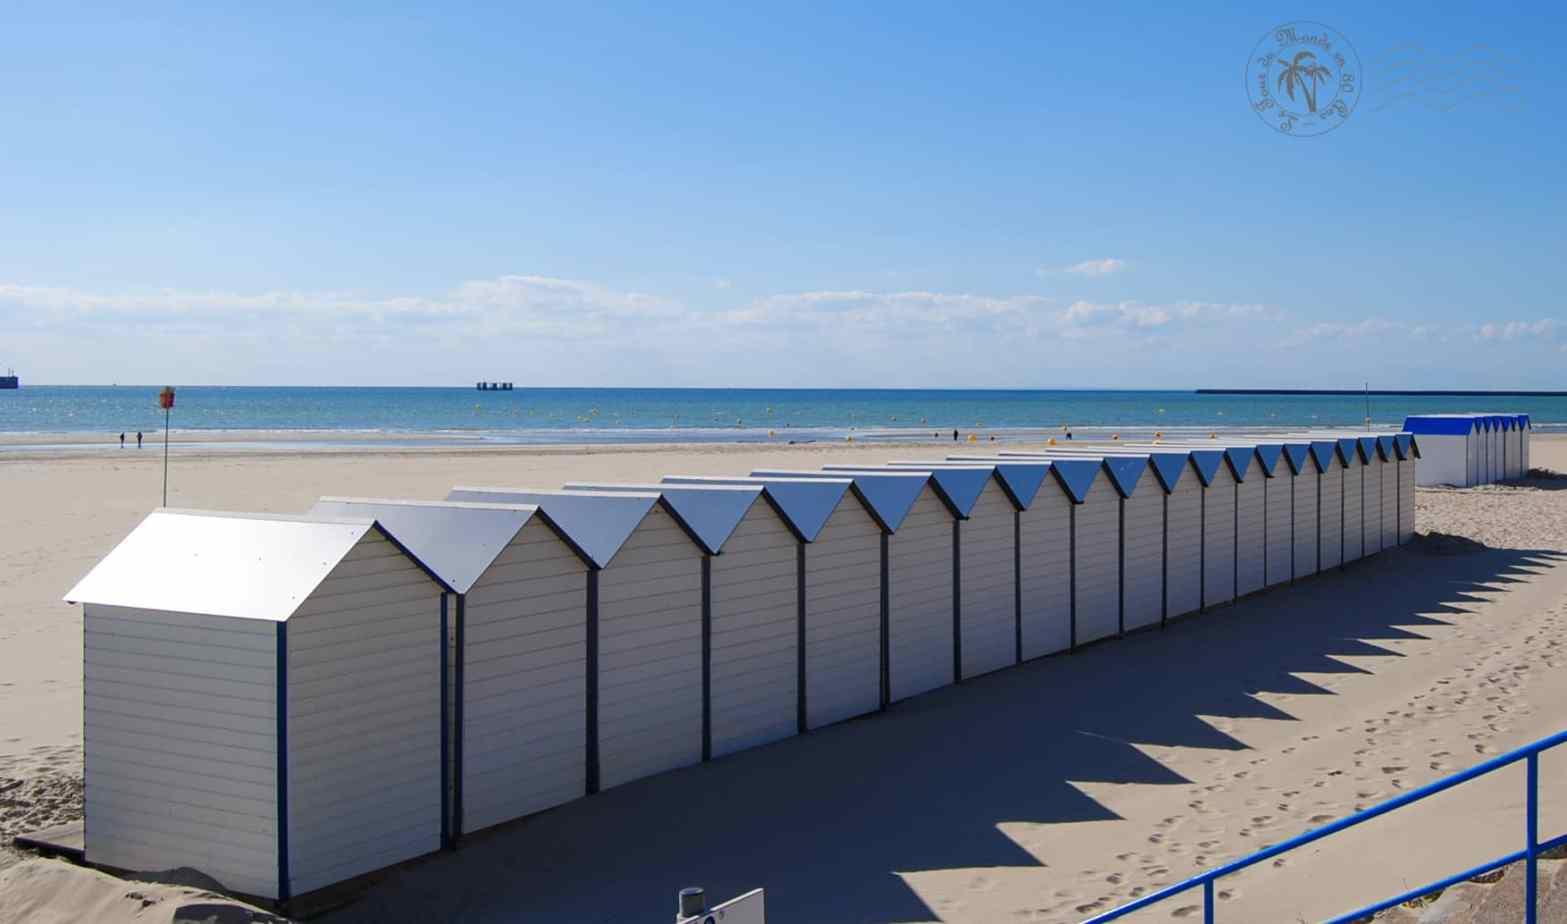 Boulogne-sur-mer - France